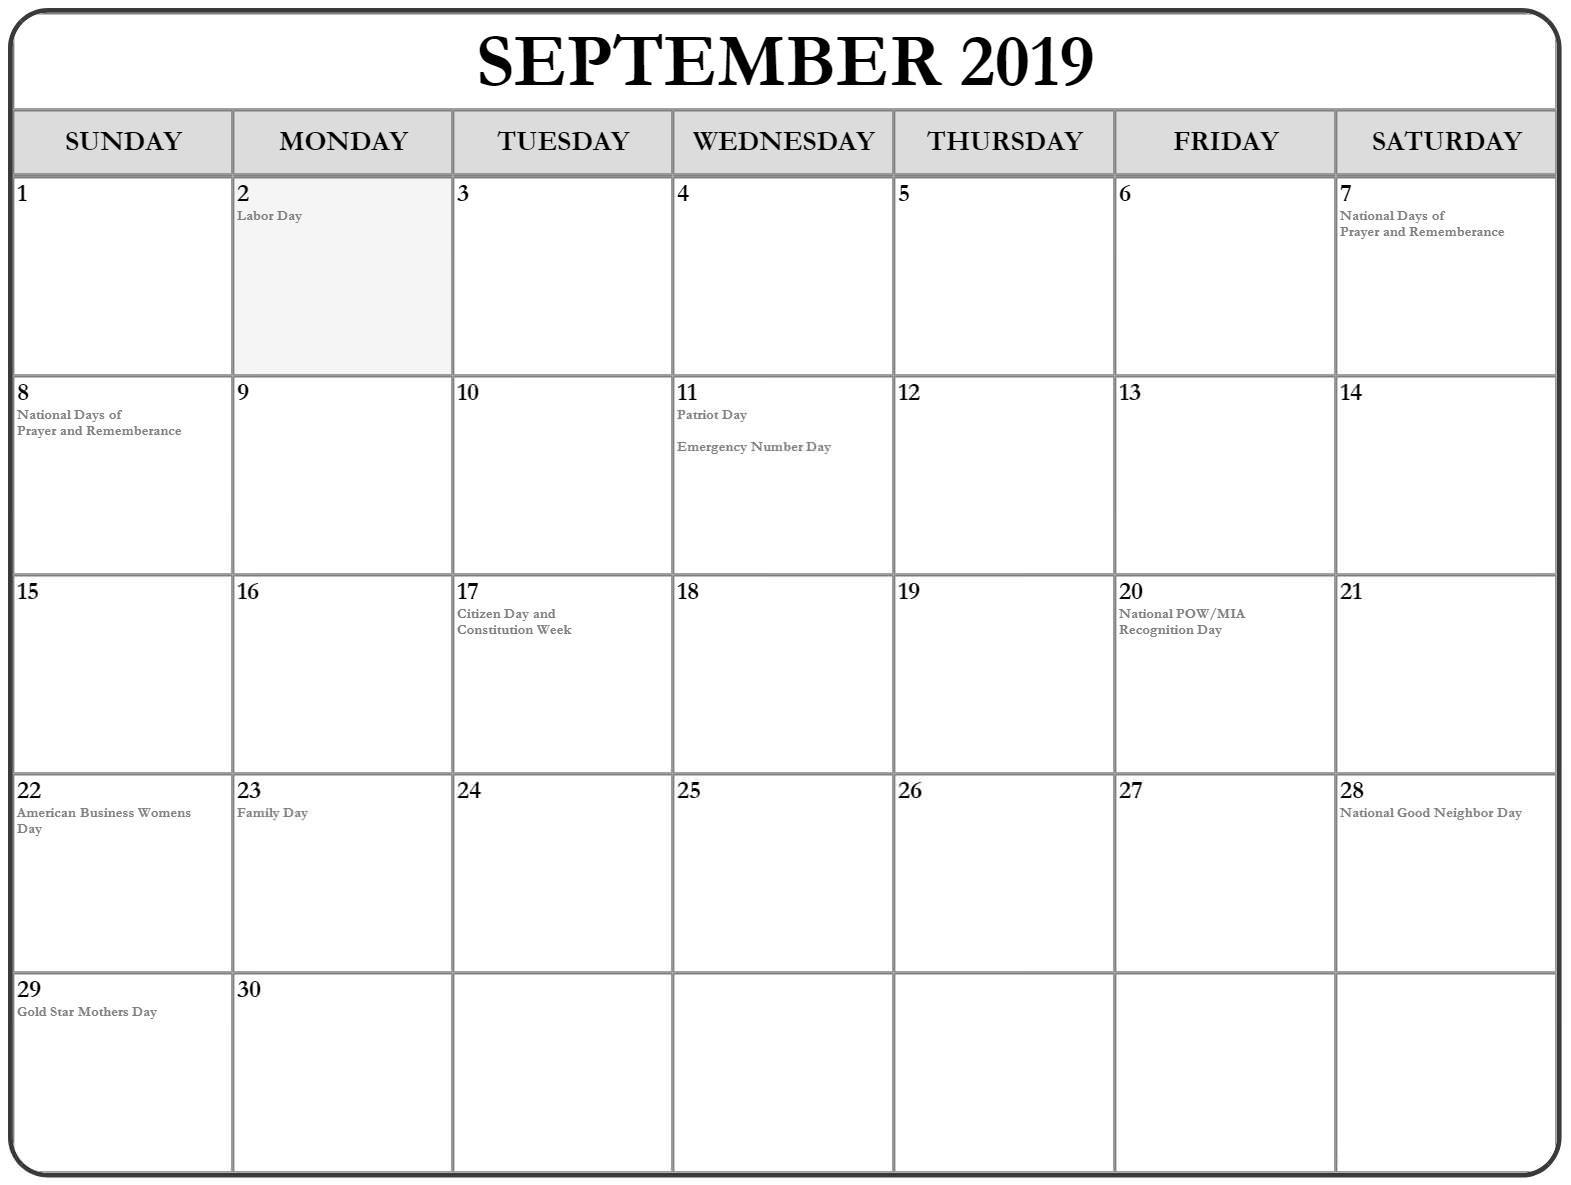 September 2019 Calendar with Holidays Printable